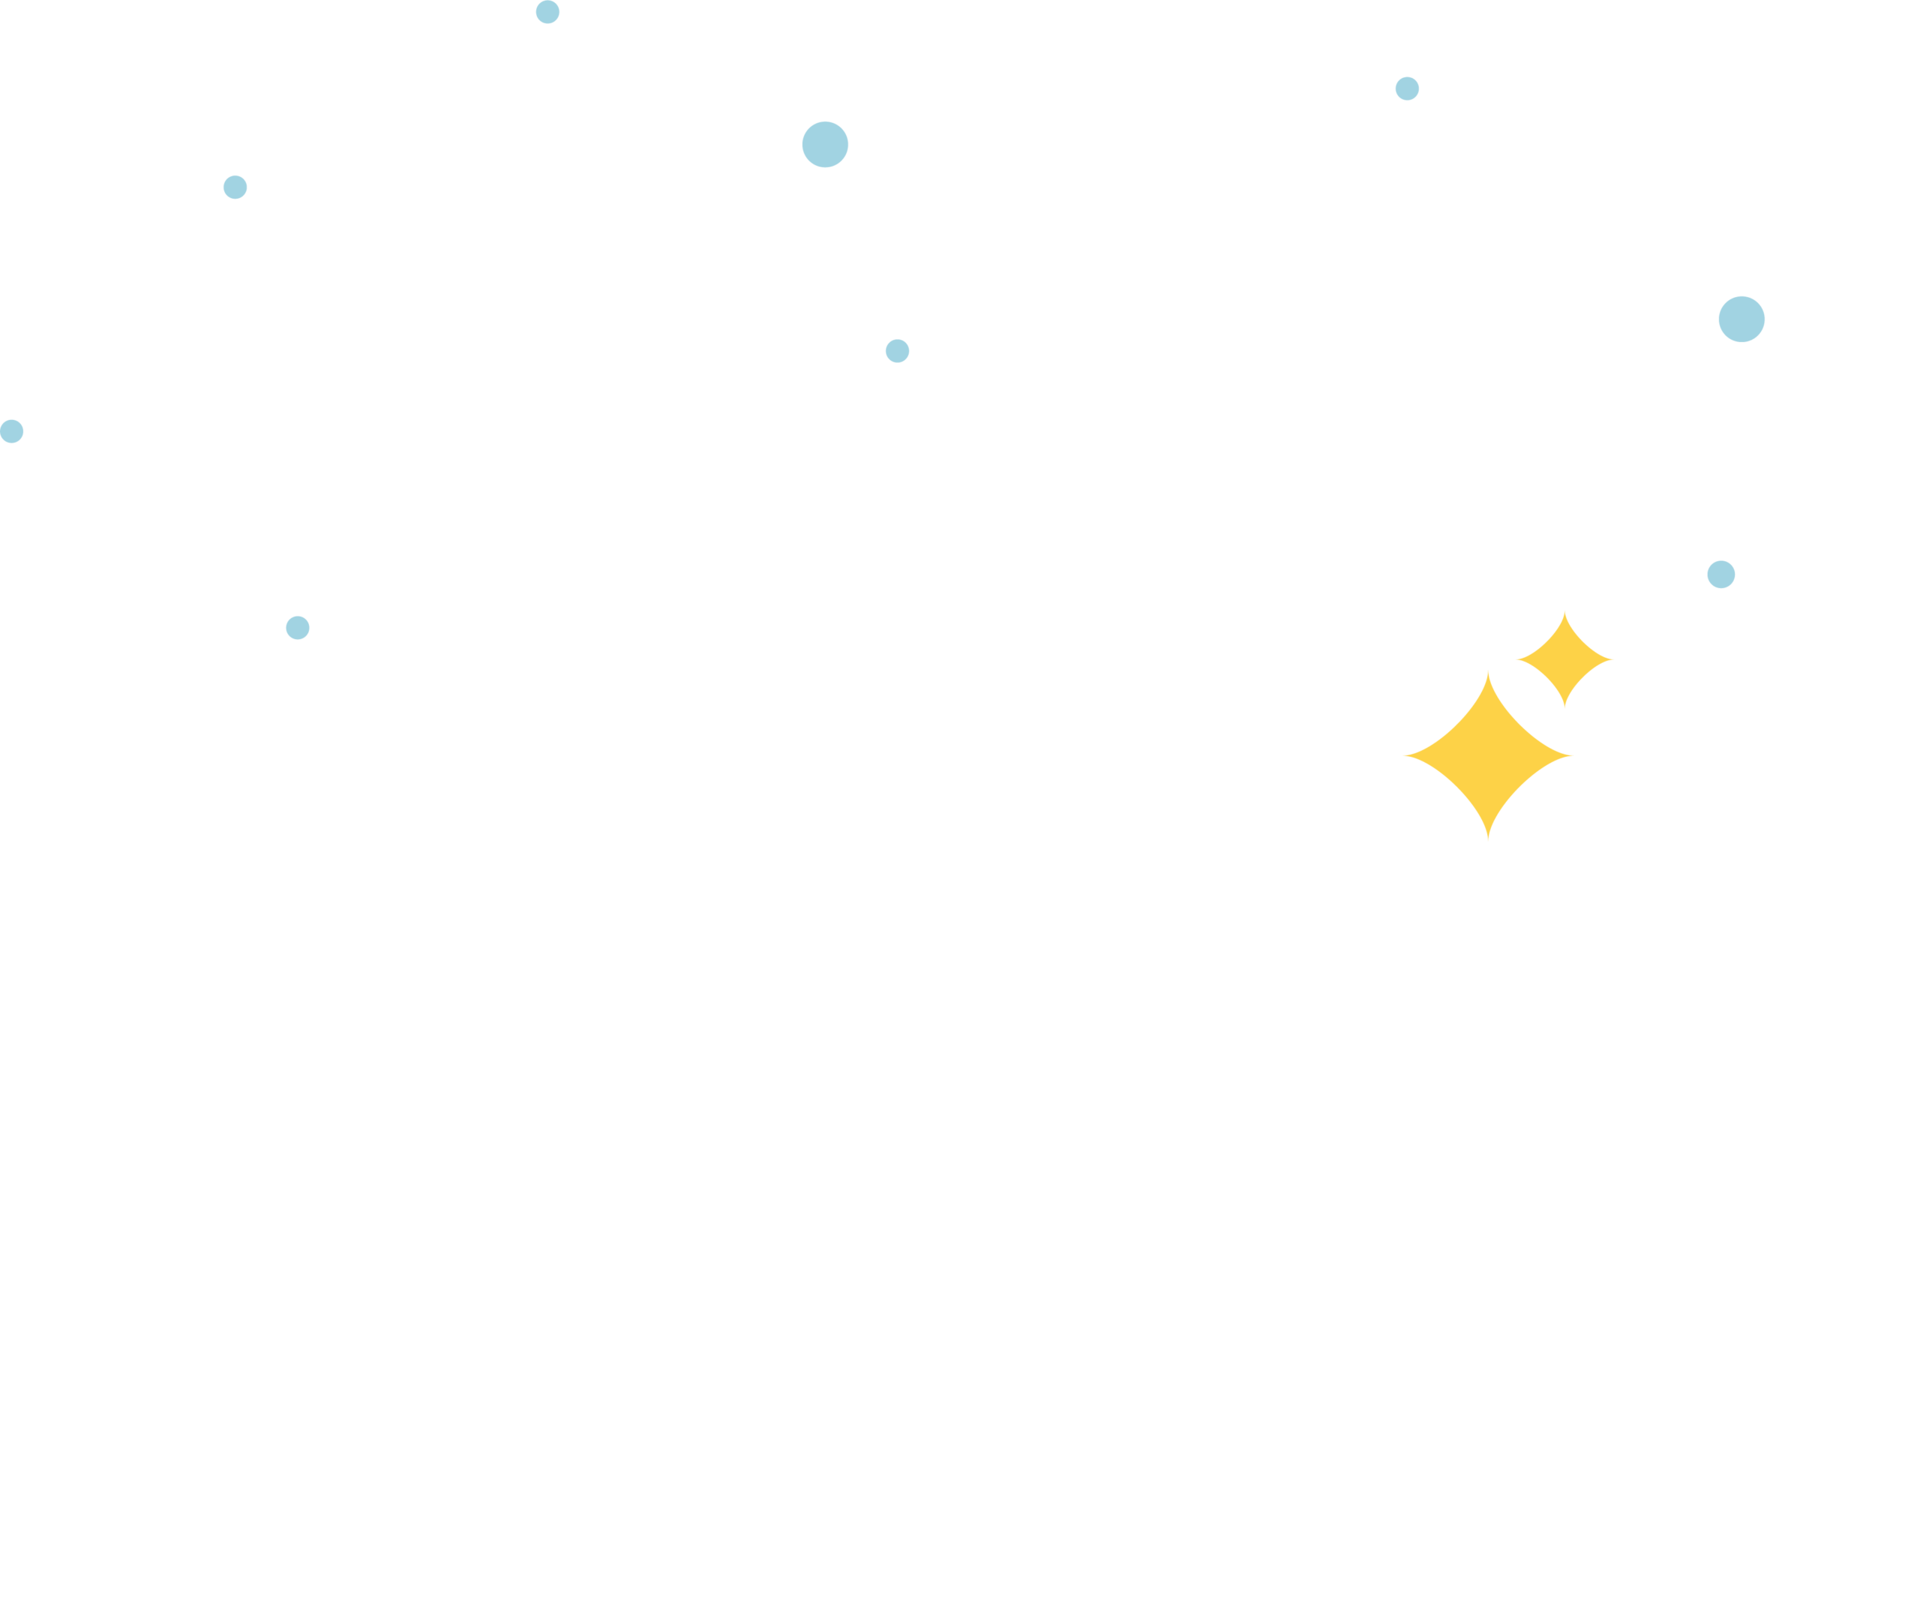 descontrucao-ilustracao-05